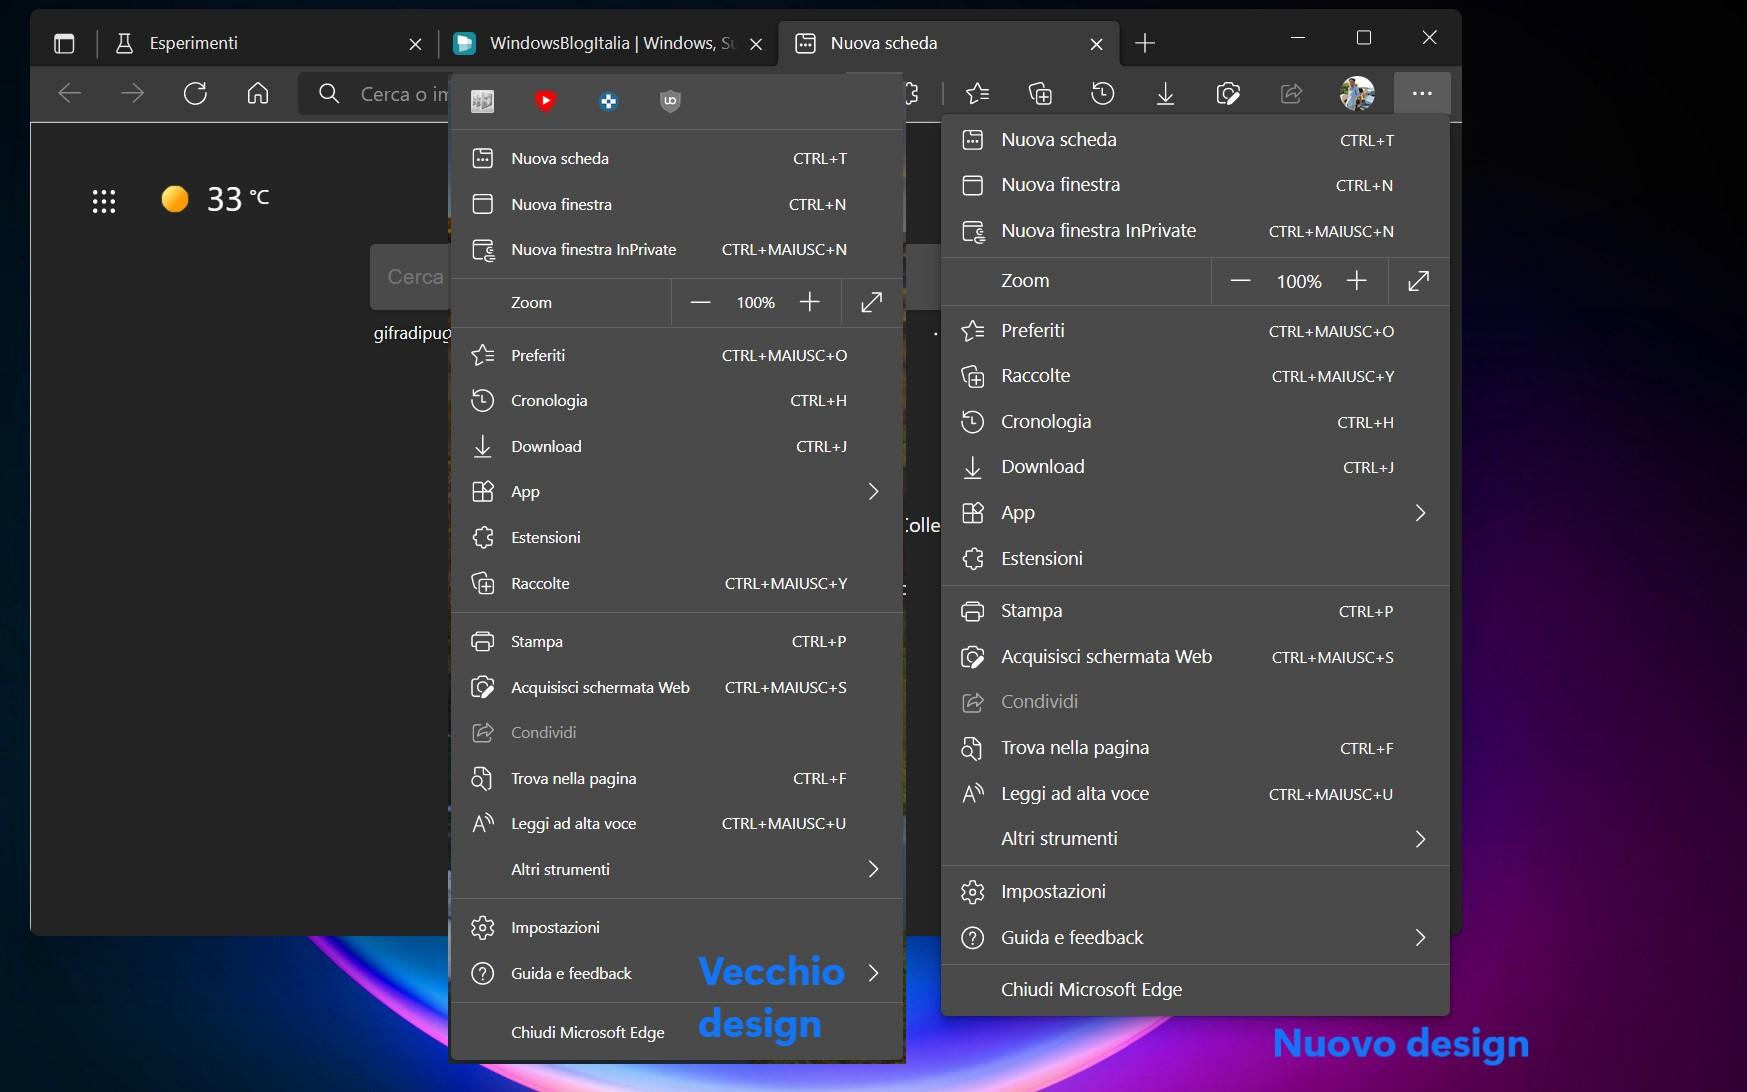 Microsoft Edge Canary - Flag - Enable Windows 11 Visual Updates - Nuovo design menu